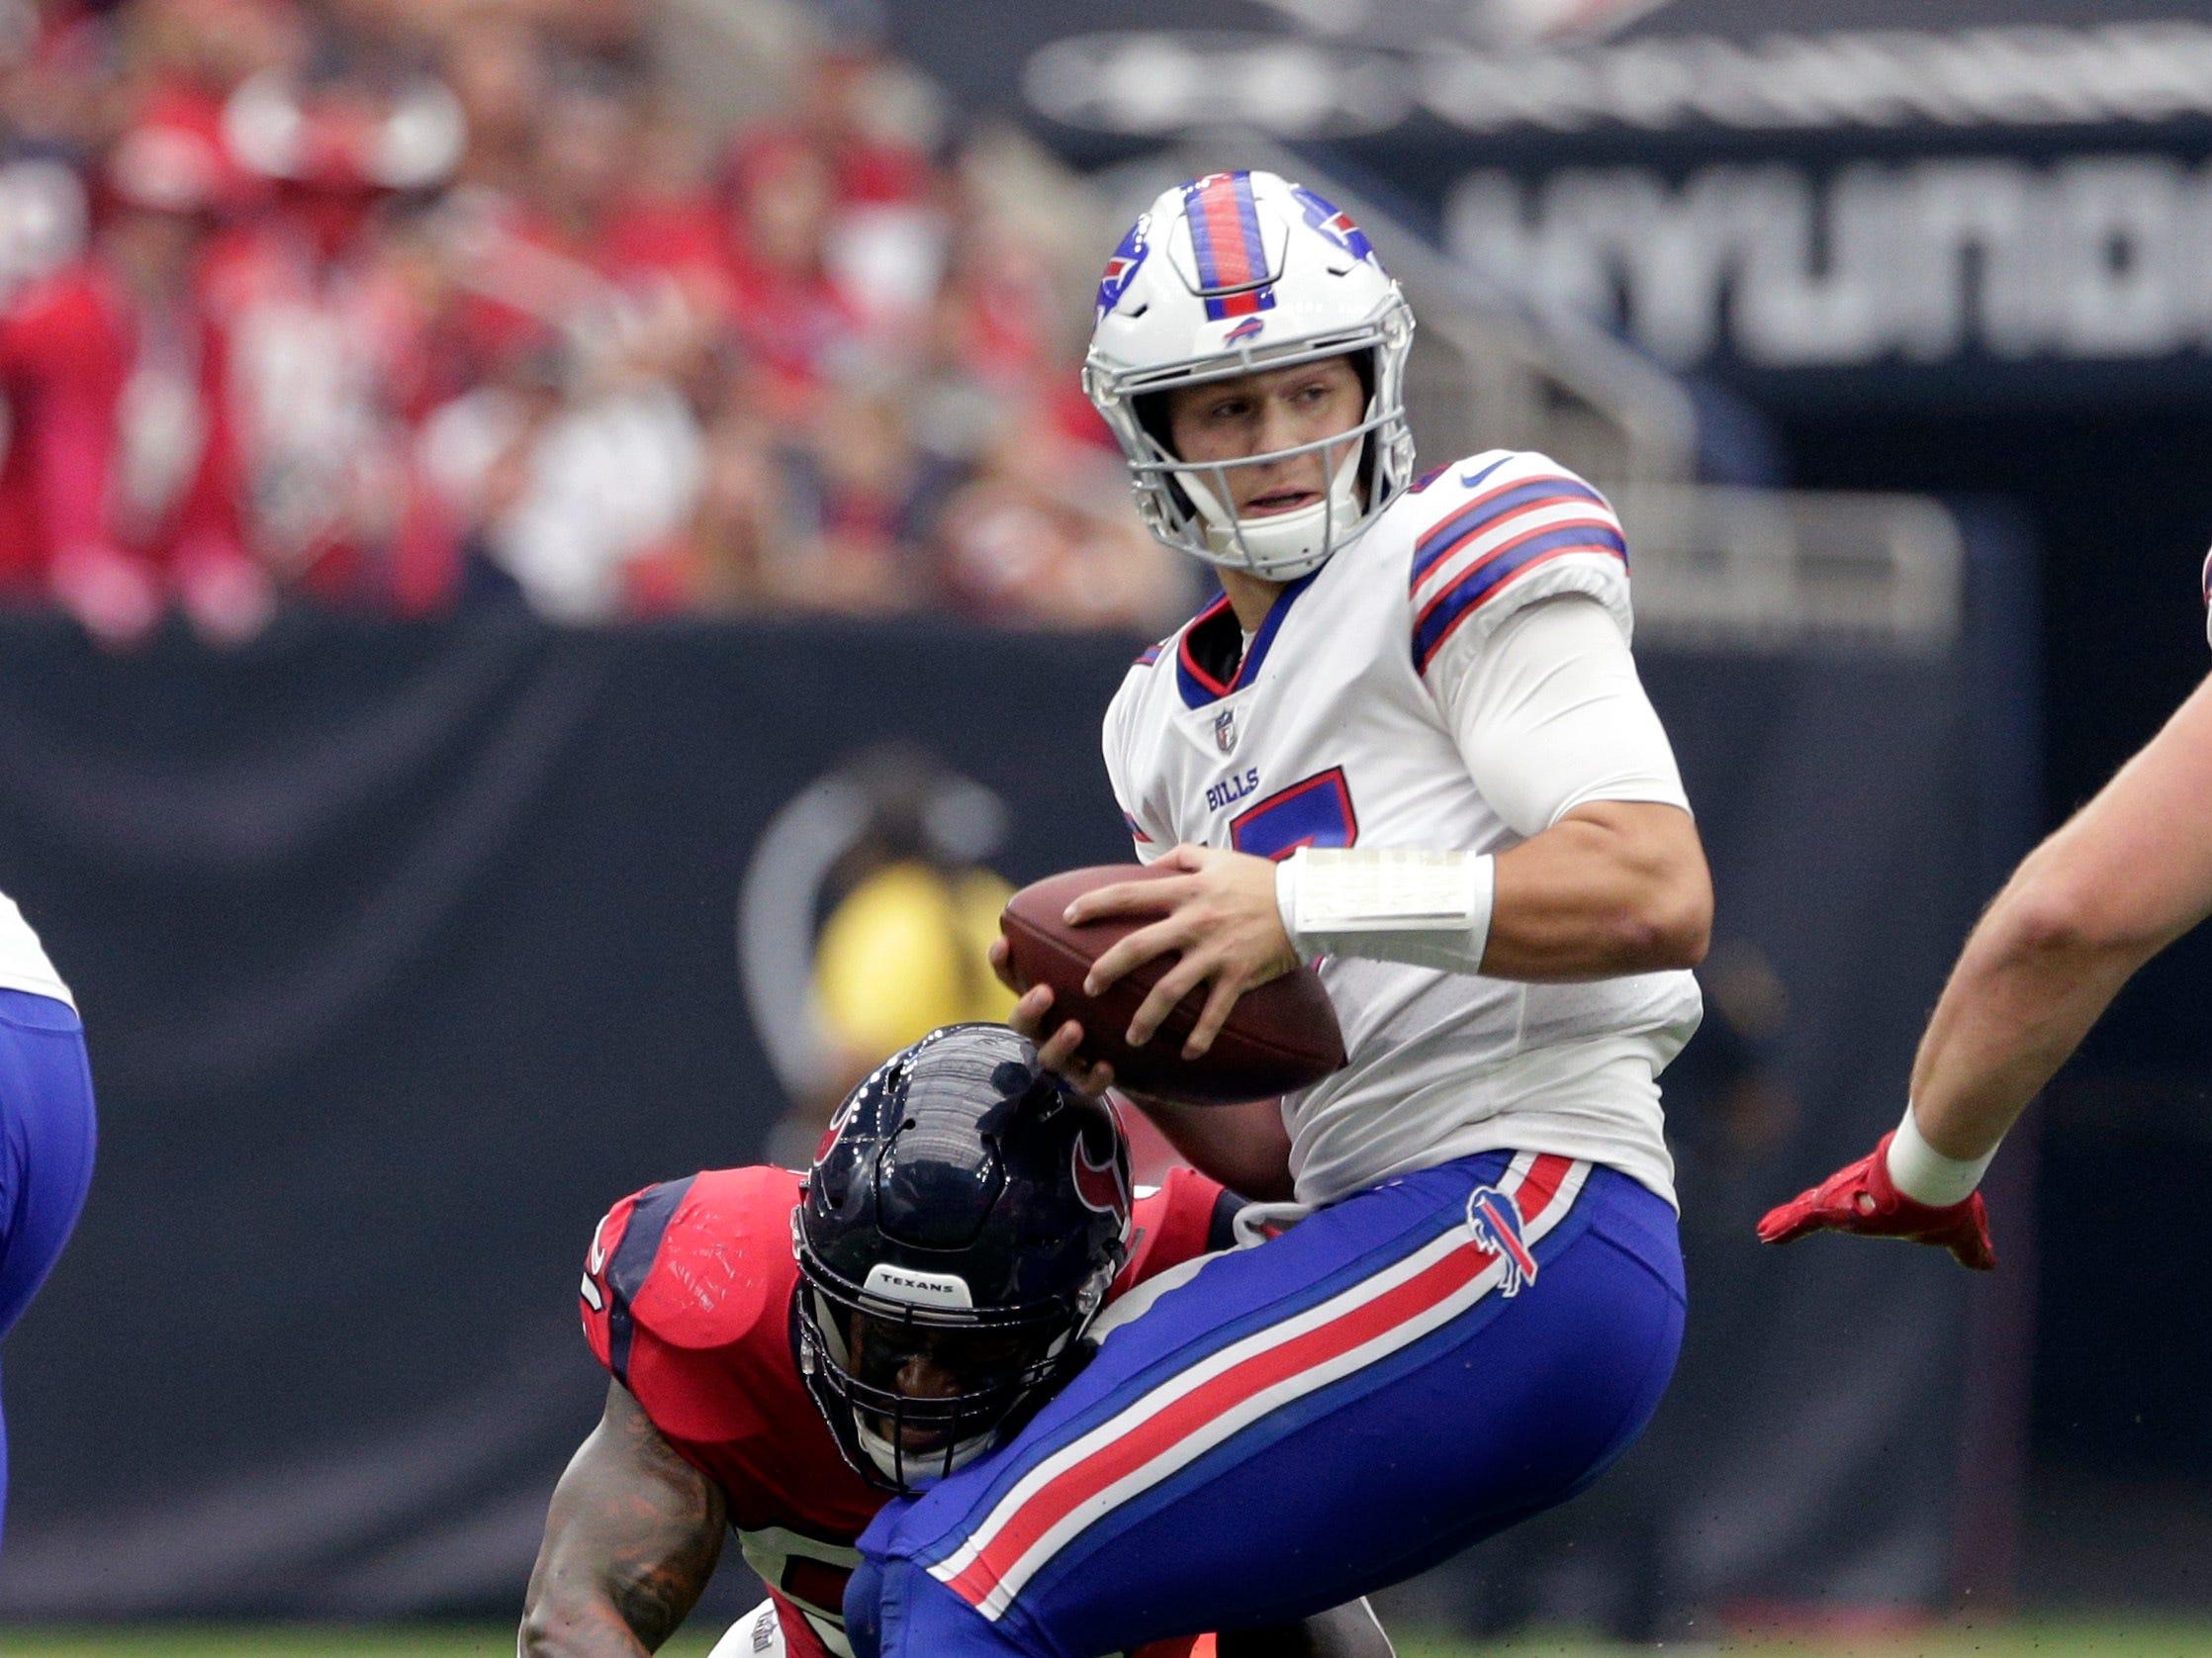 Buffalo Bills quarterback Josh Allen (17) is hit by Houston Texans linebacker Benardrick McKinney (55) during the first quarter of an NFL football game, Sunday, Oct. 14, 2018, in Houston. (AP Photo/Michael Wyke)